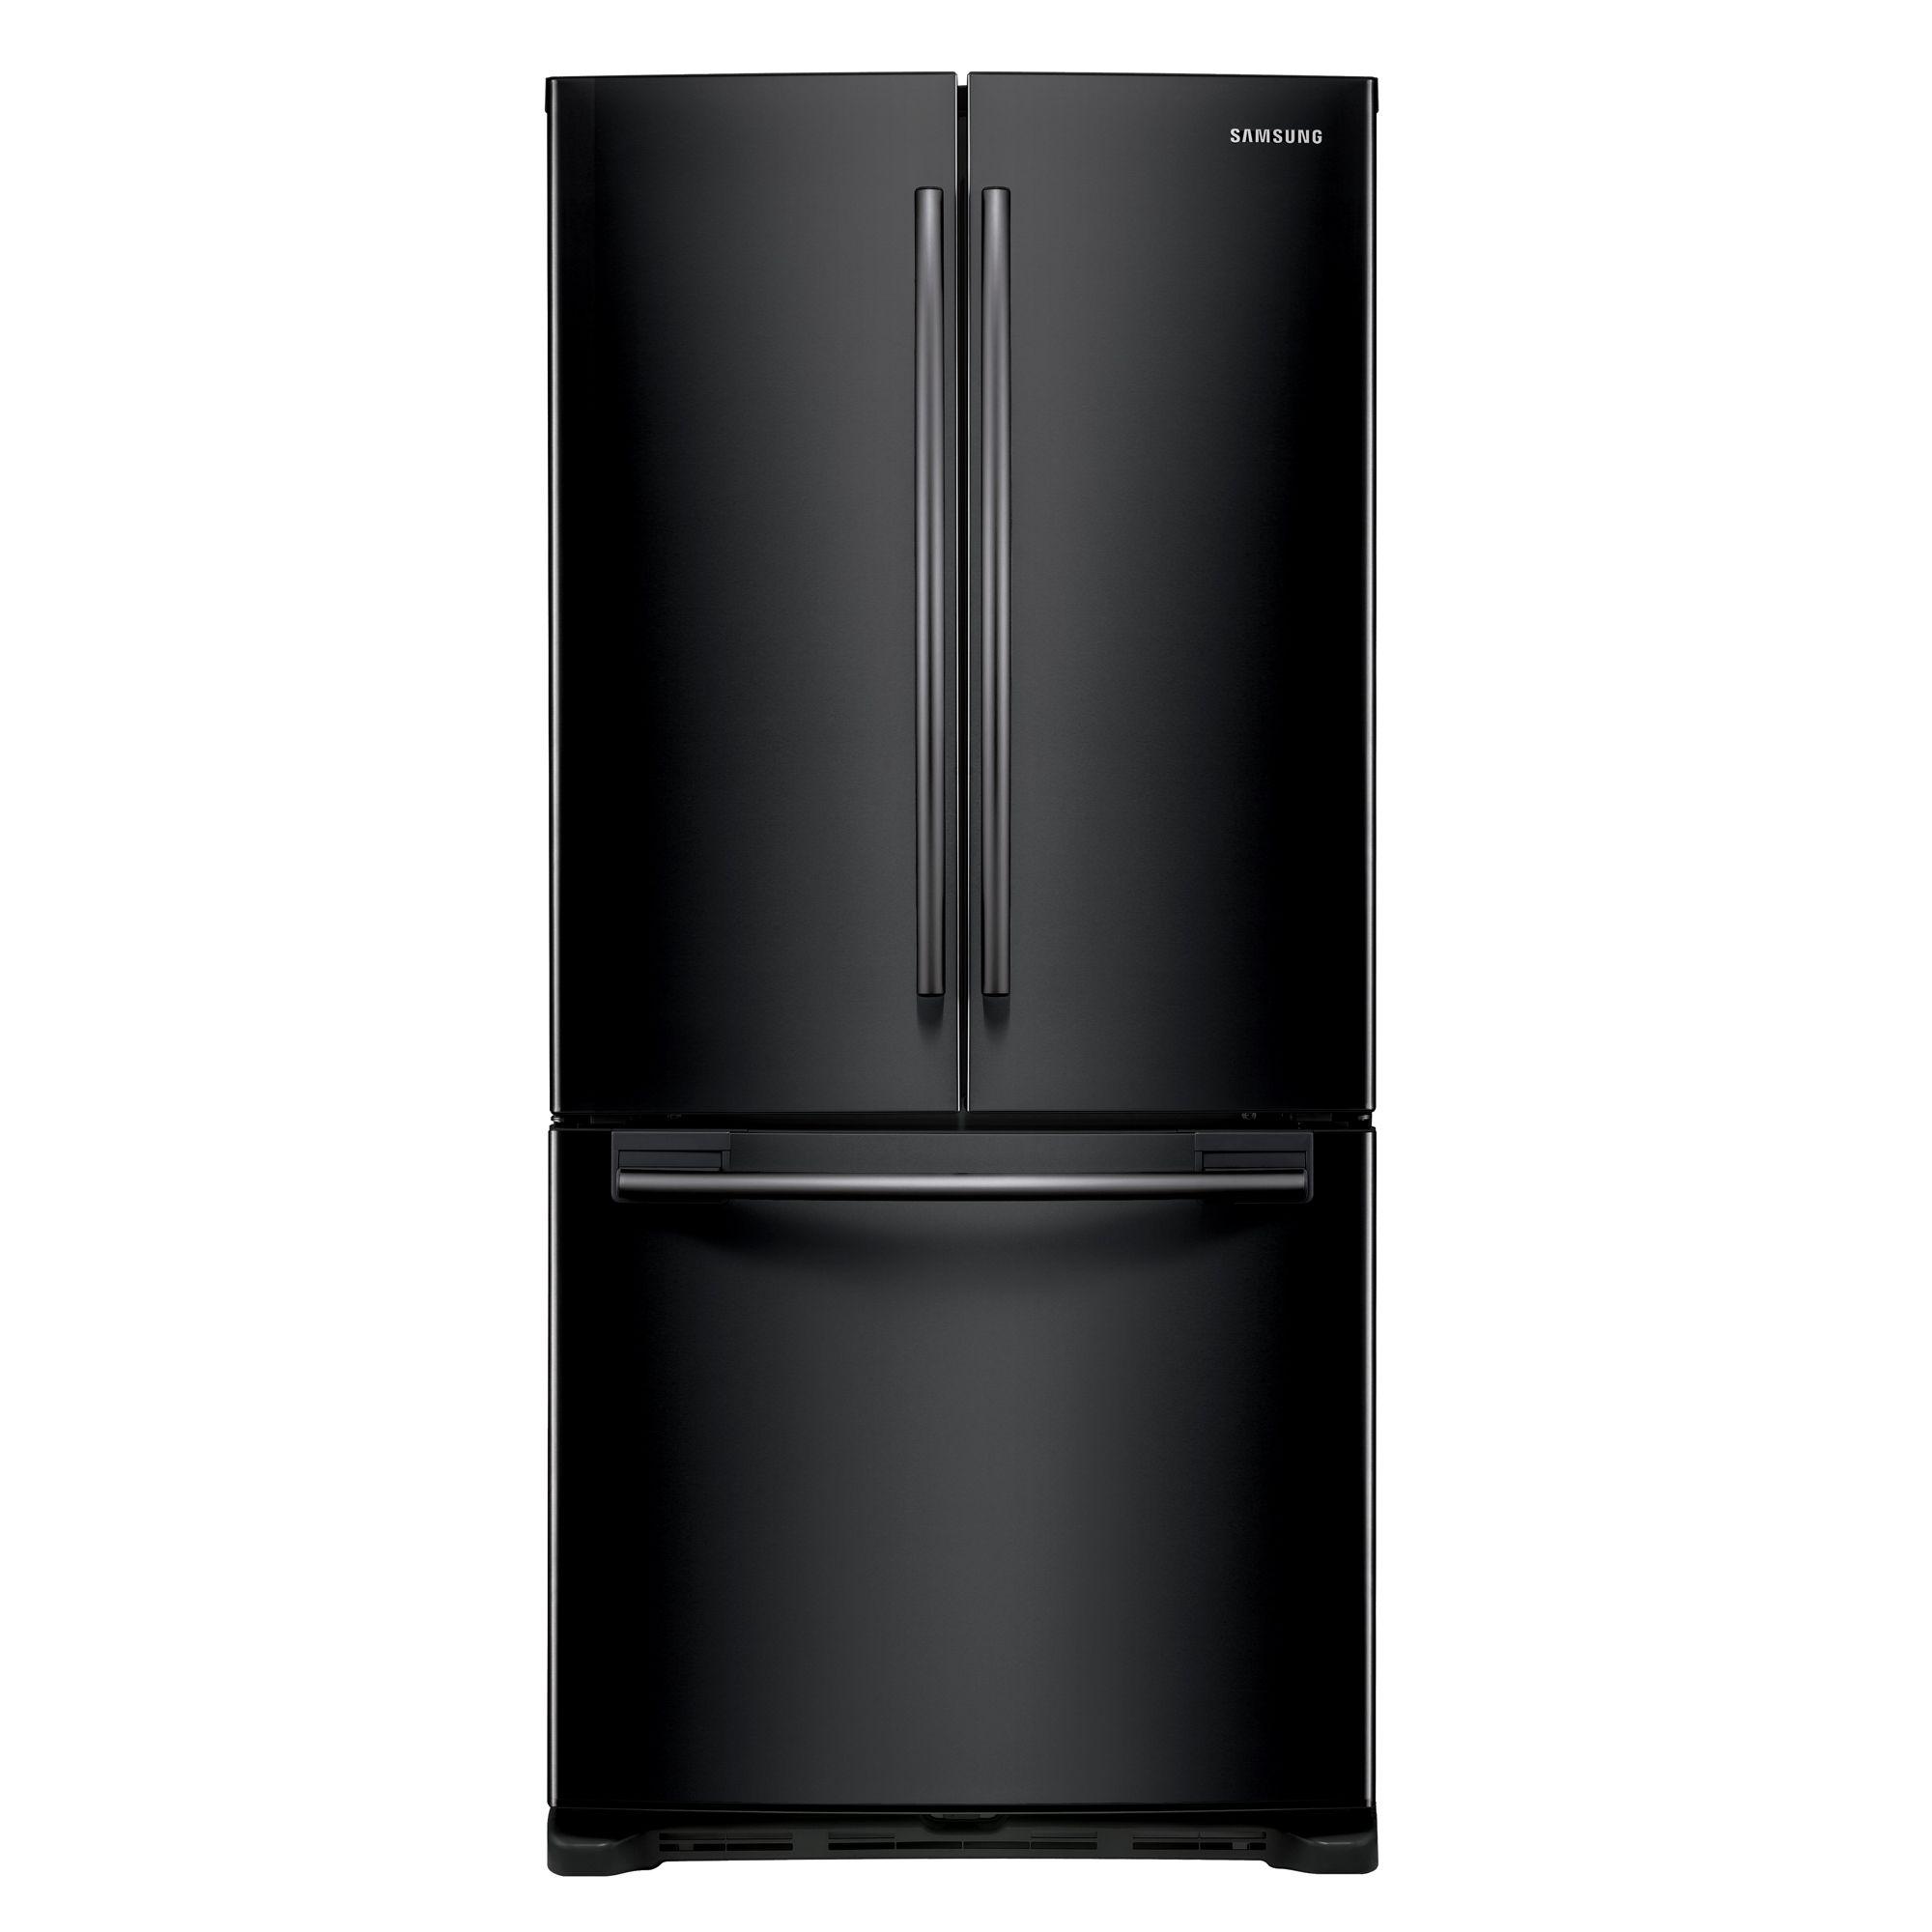 hight resolution of samsung rf217acbp 20 0 cu ft french door bottom freezer samsung rf217acbp problems part diagram for samsung refrigerator rf217acbp